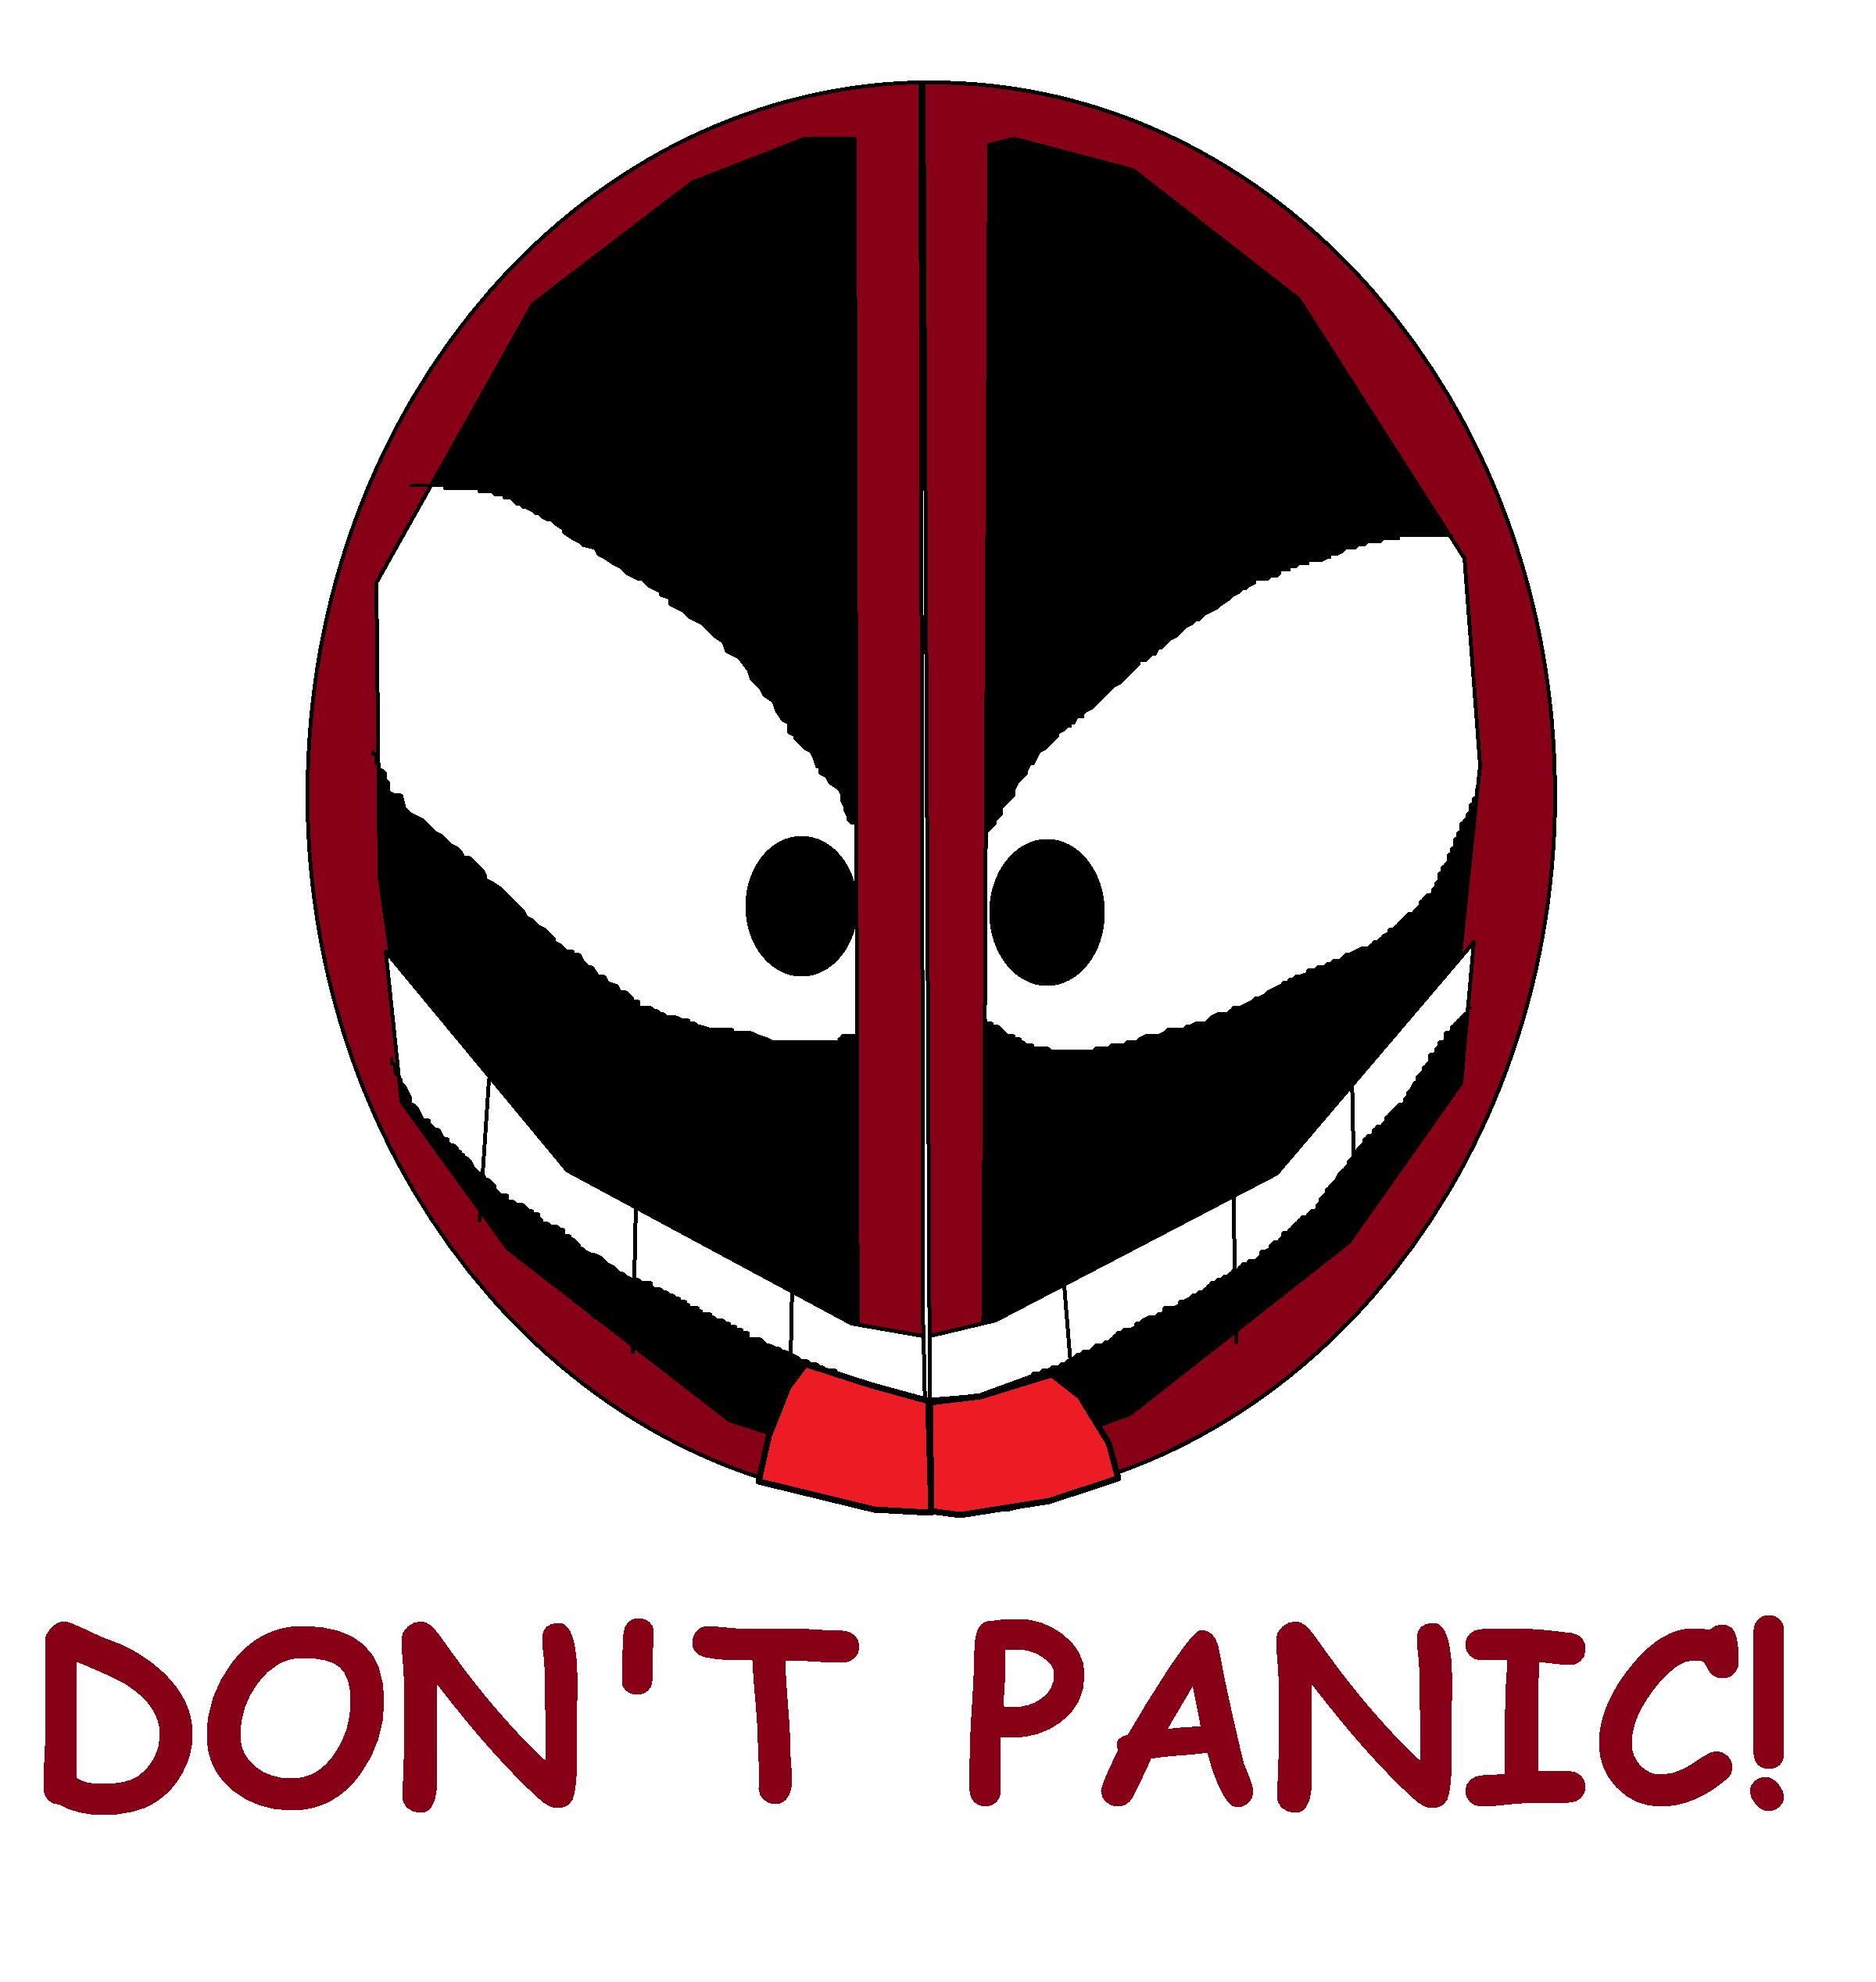 deadpoollogo explore deadpoollogo on deviantart rh deviantart com Deadpool 2 2017 Face Deadpool Face Sketch